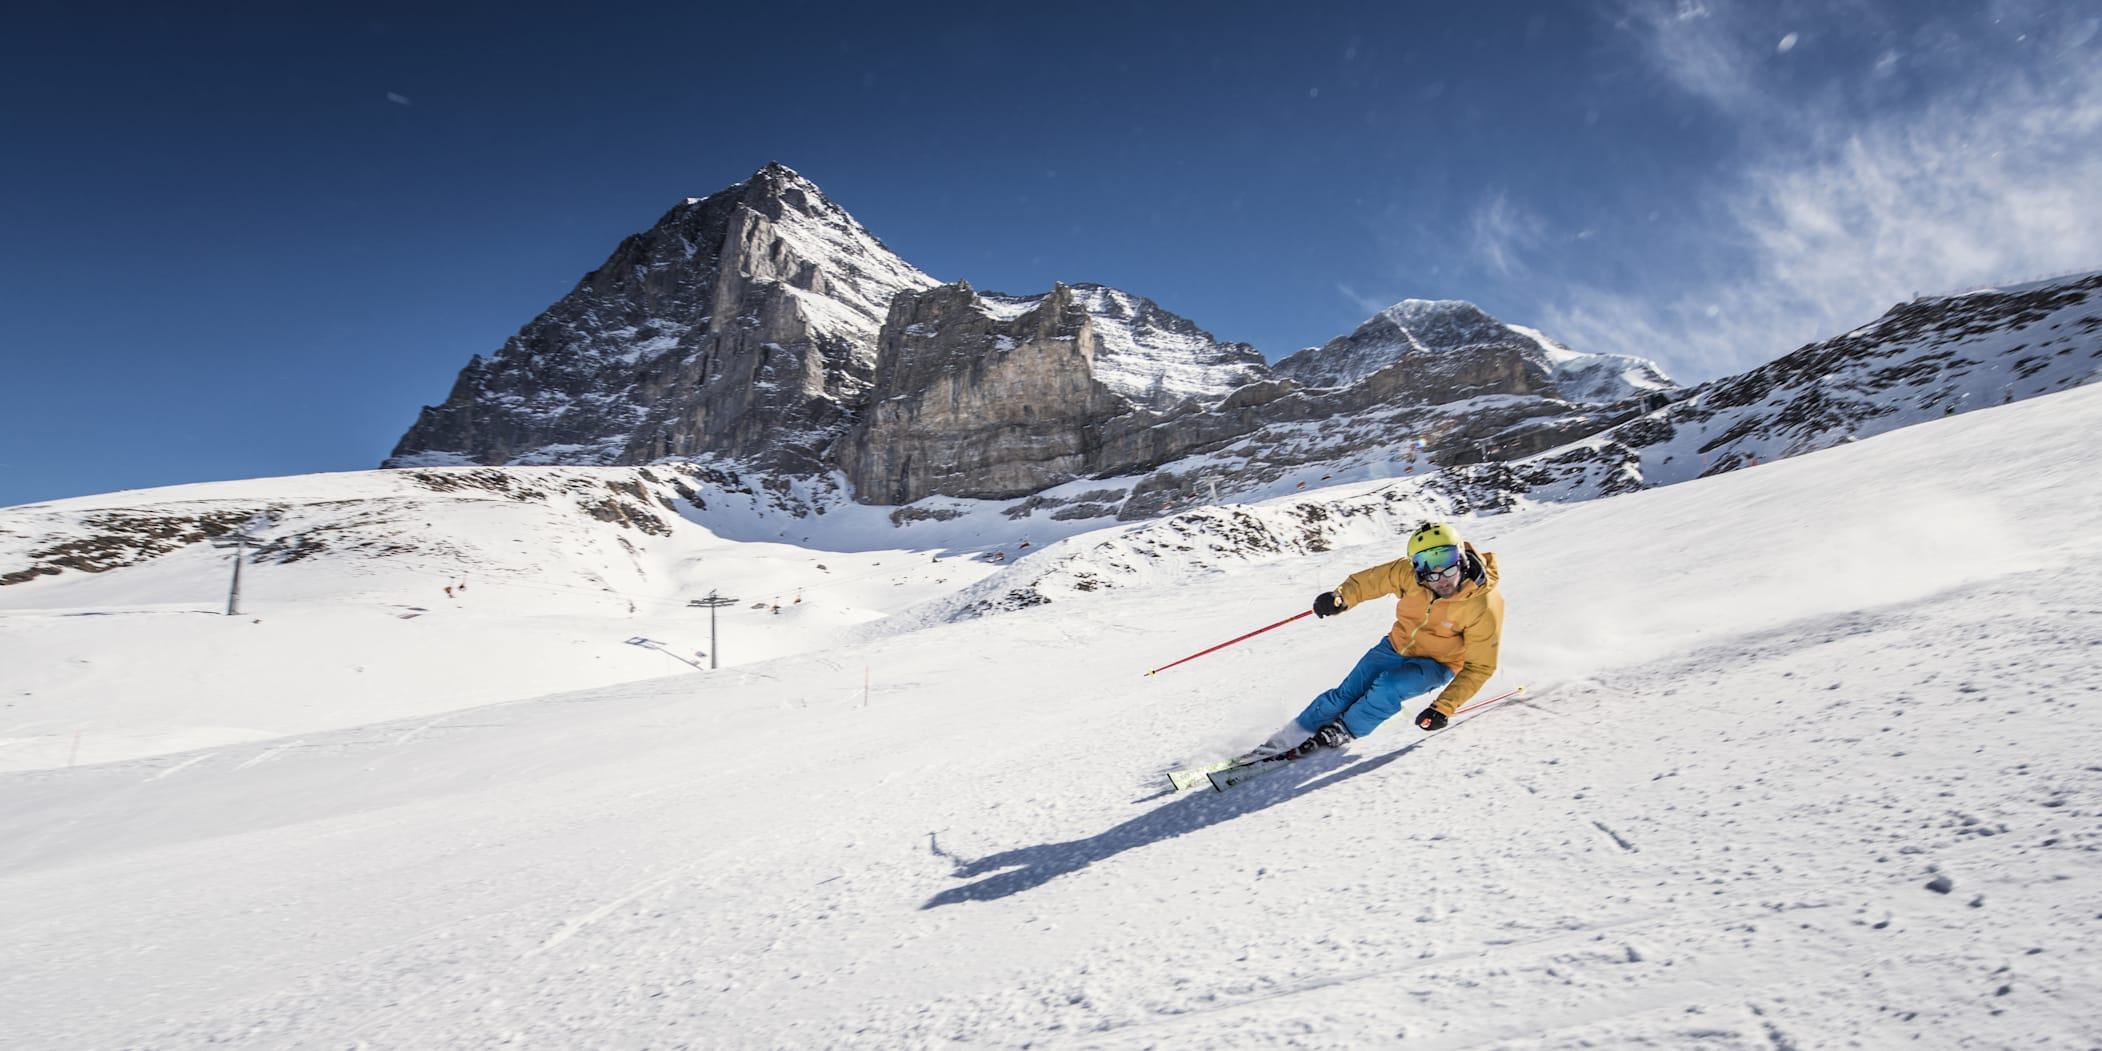 Jungfrau Ski Region Skiing Piste Snow Eiger